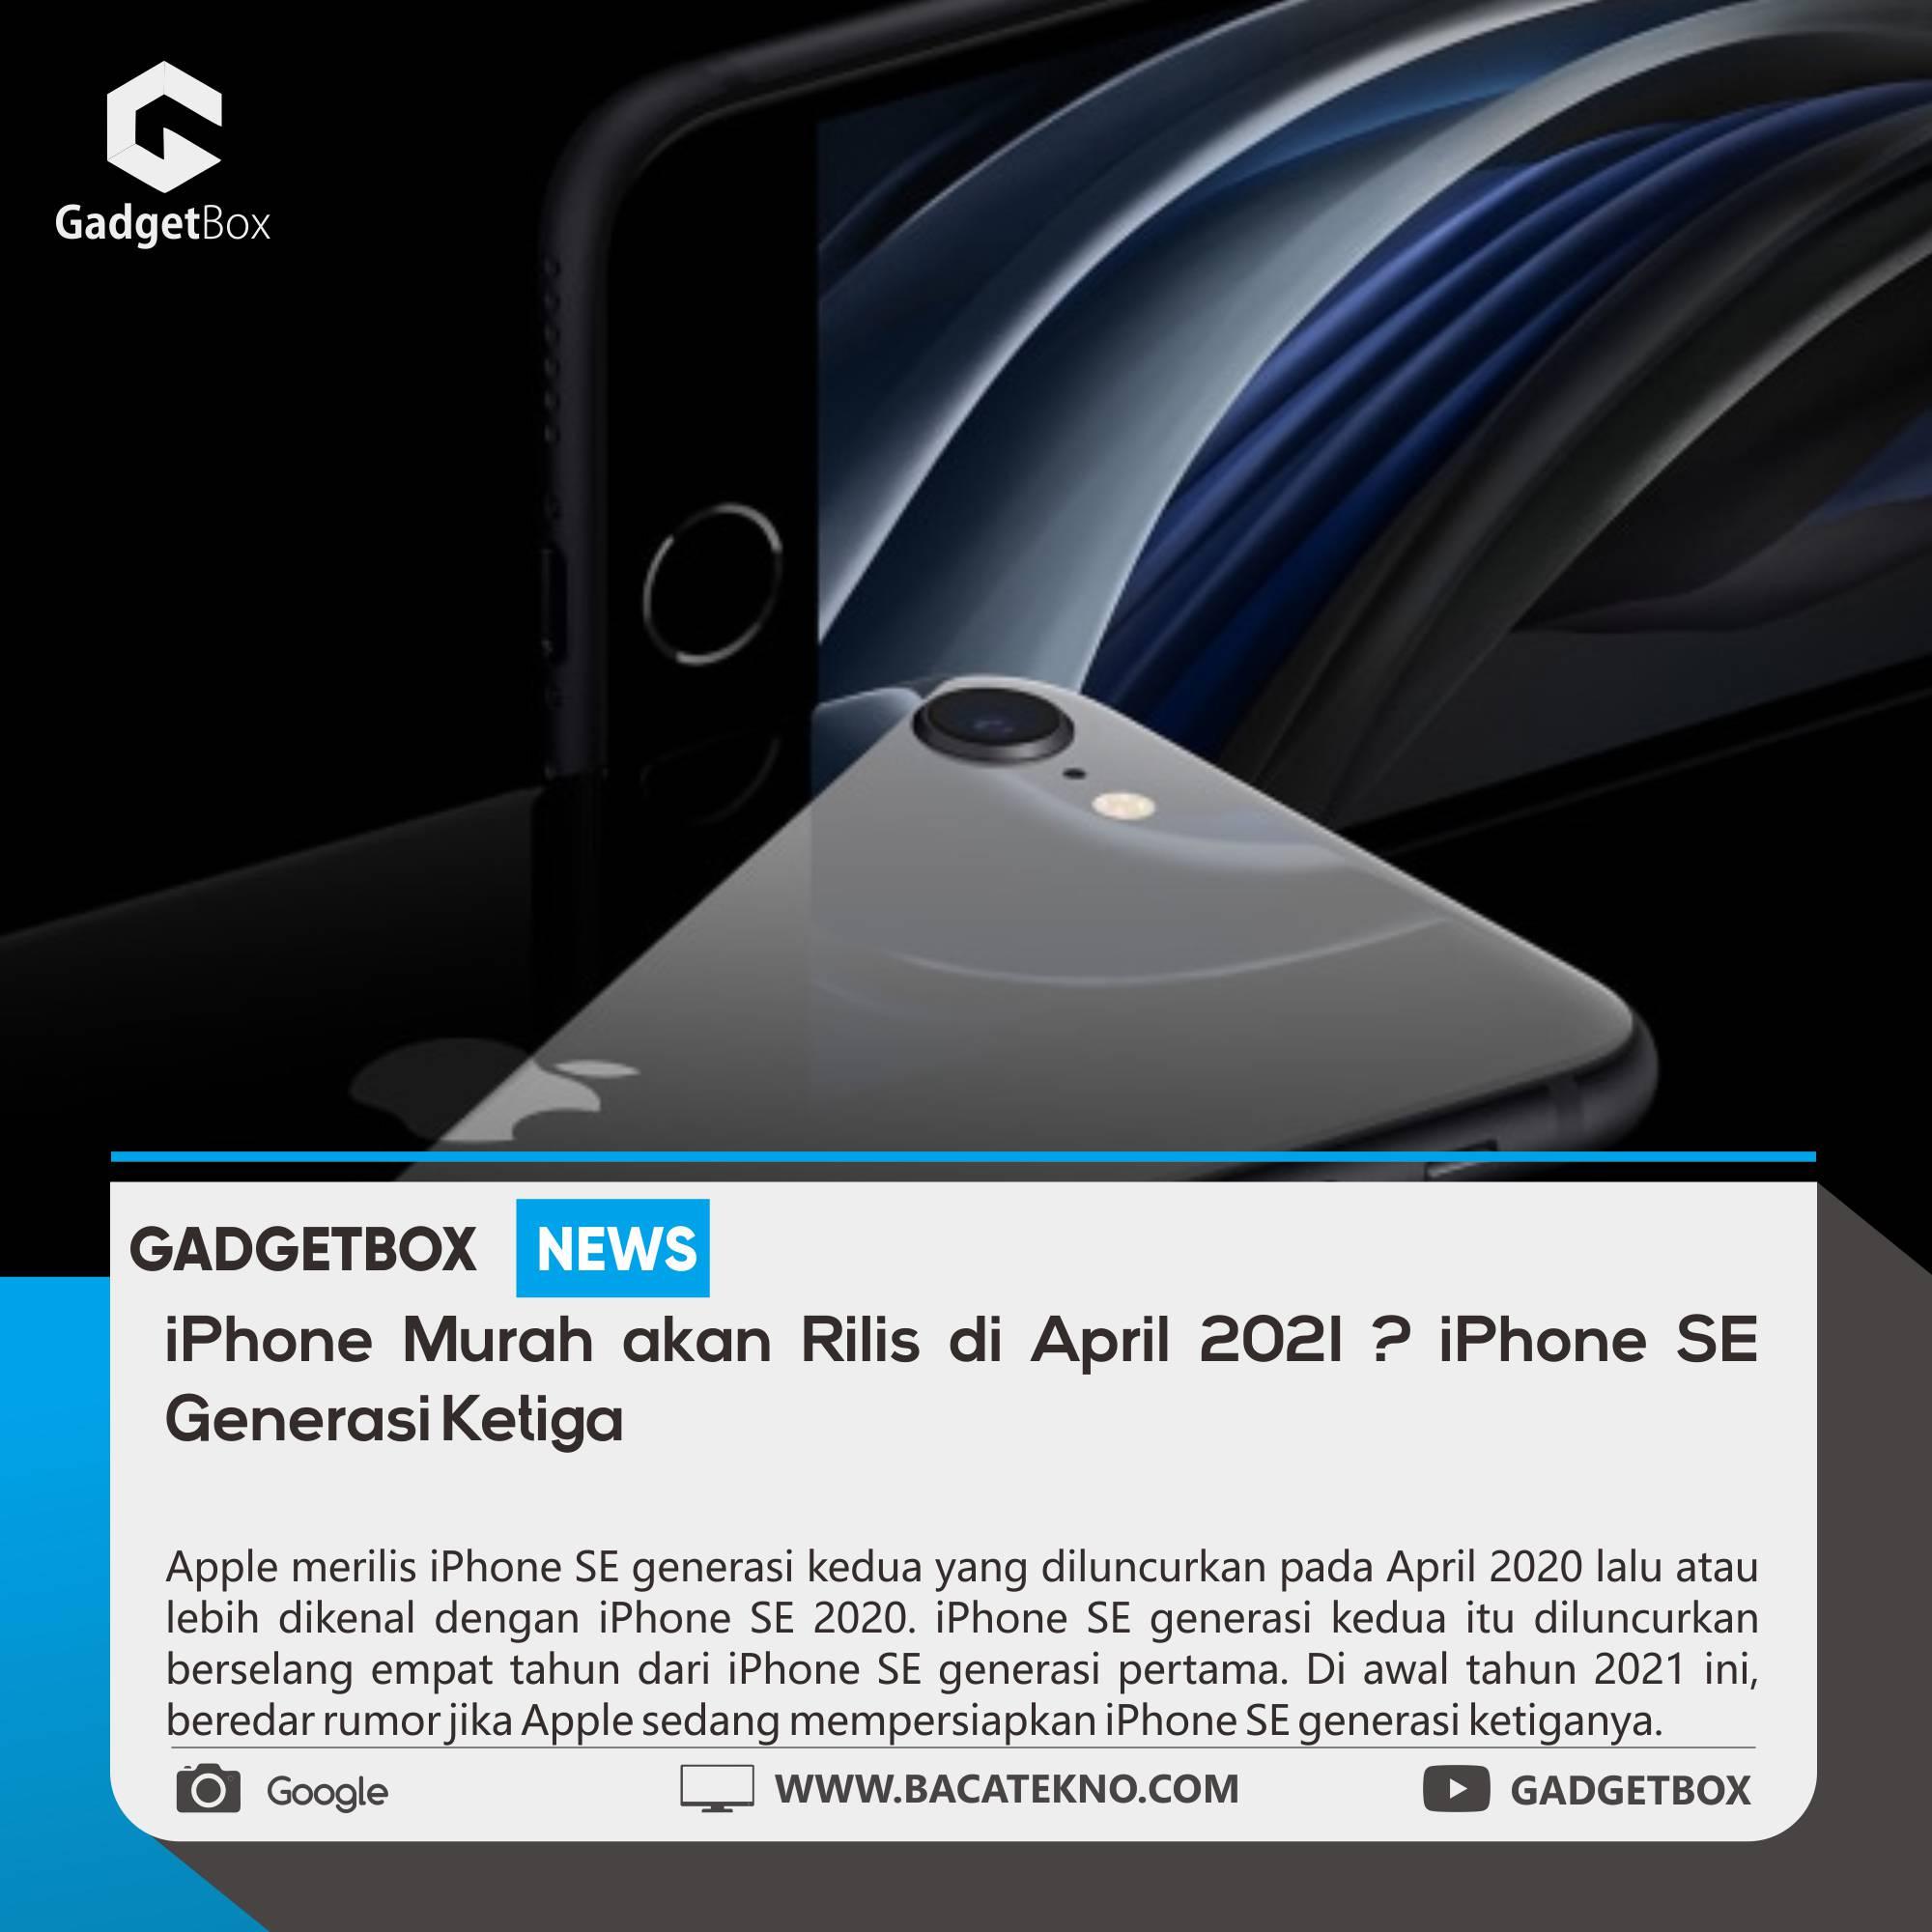 iPhone Murah akan Rilis di April 2021?   BacaTekno.com